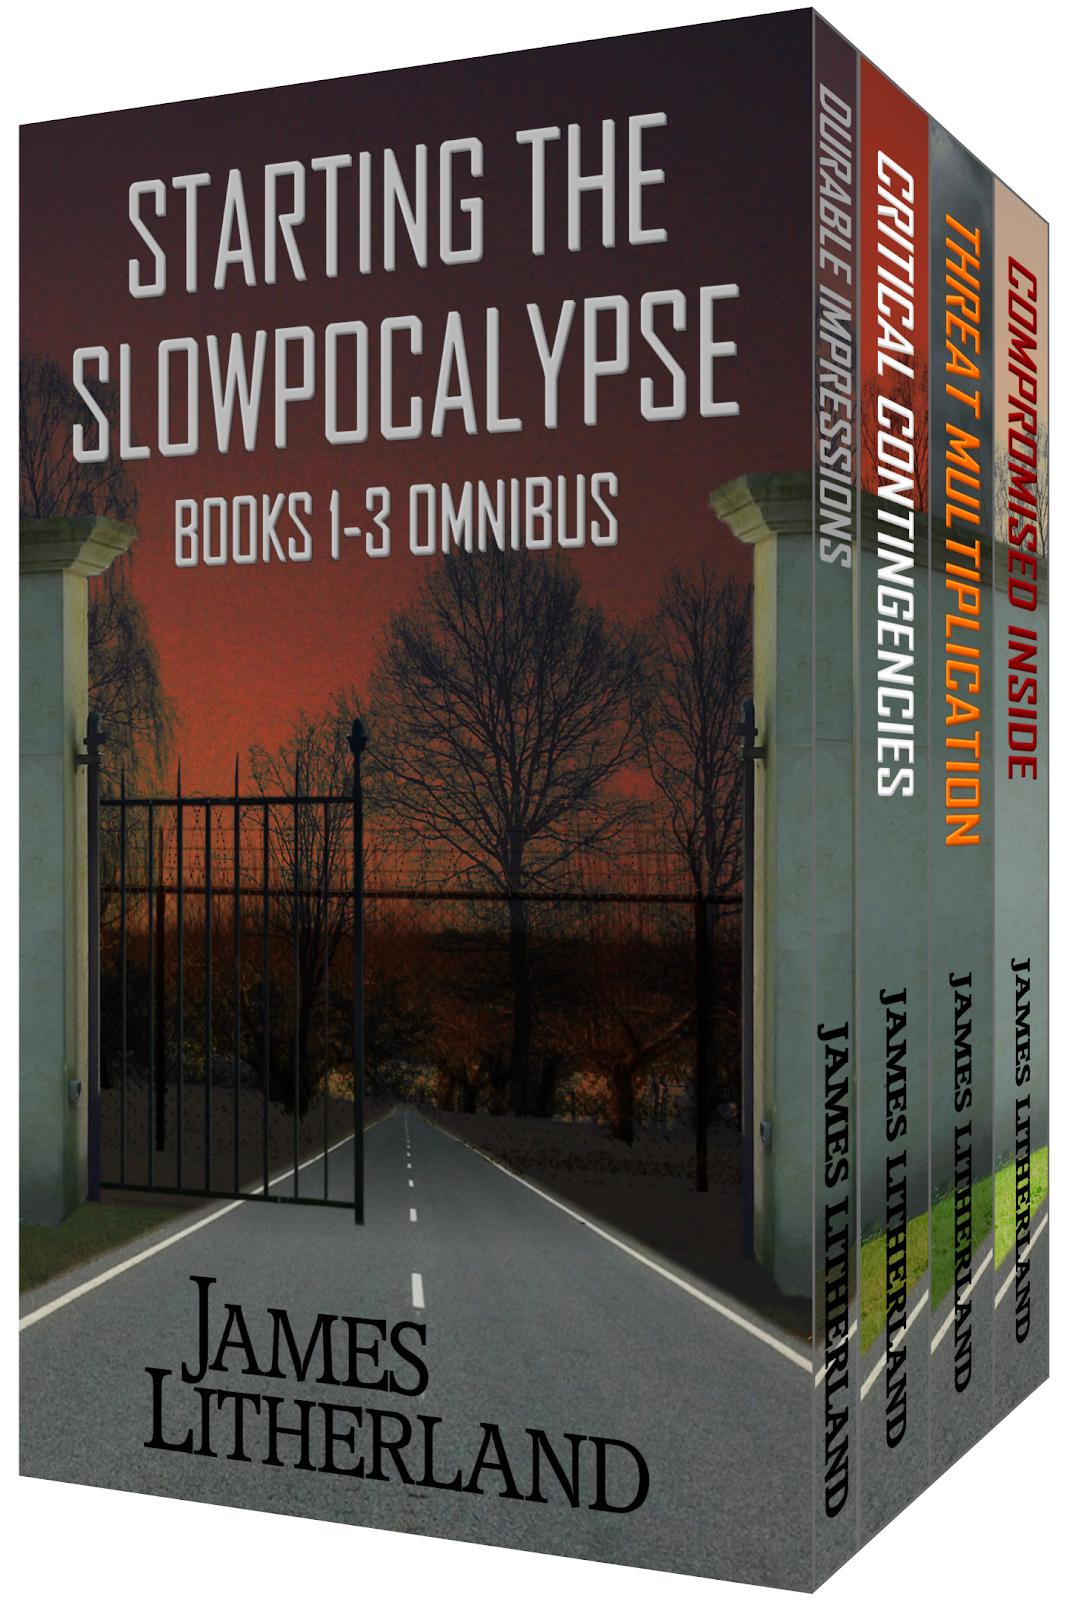 Slowpocalypse Books #1-3 Omnibus edition